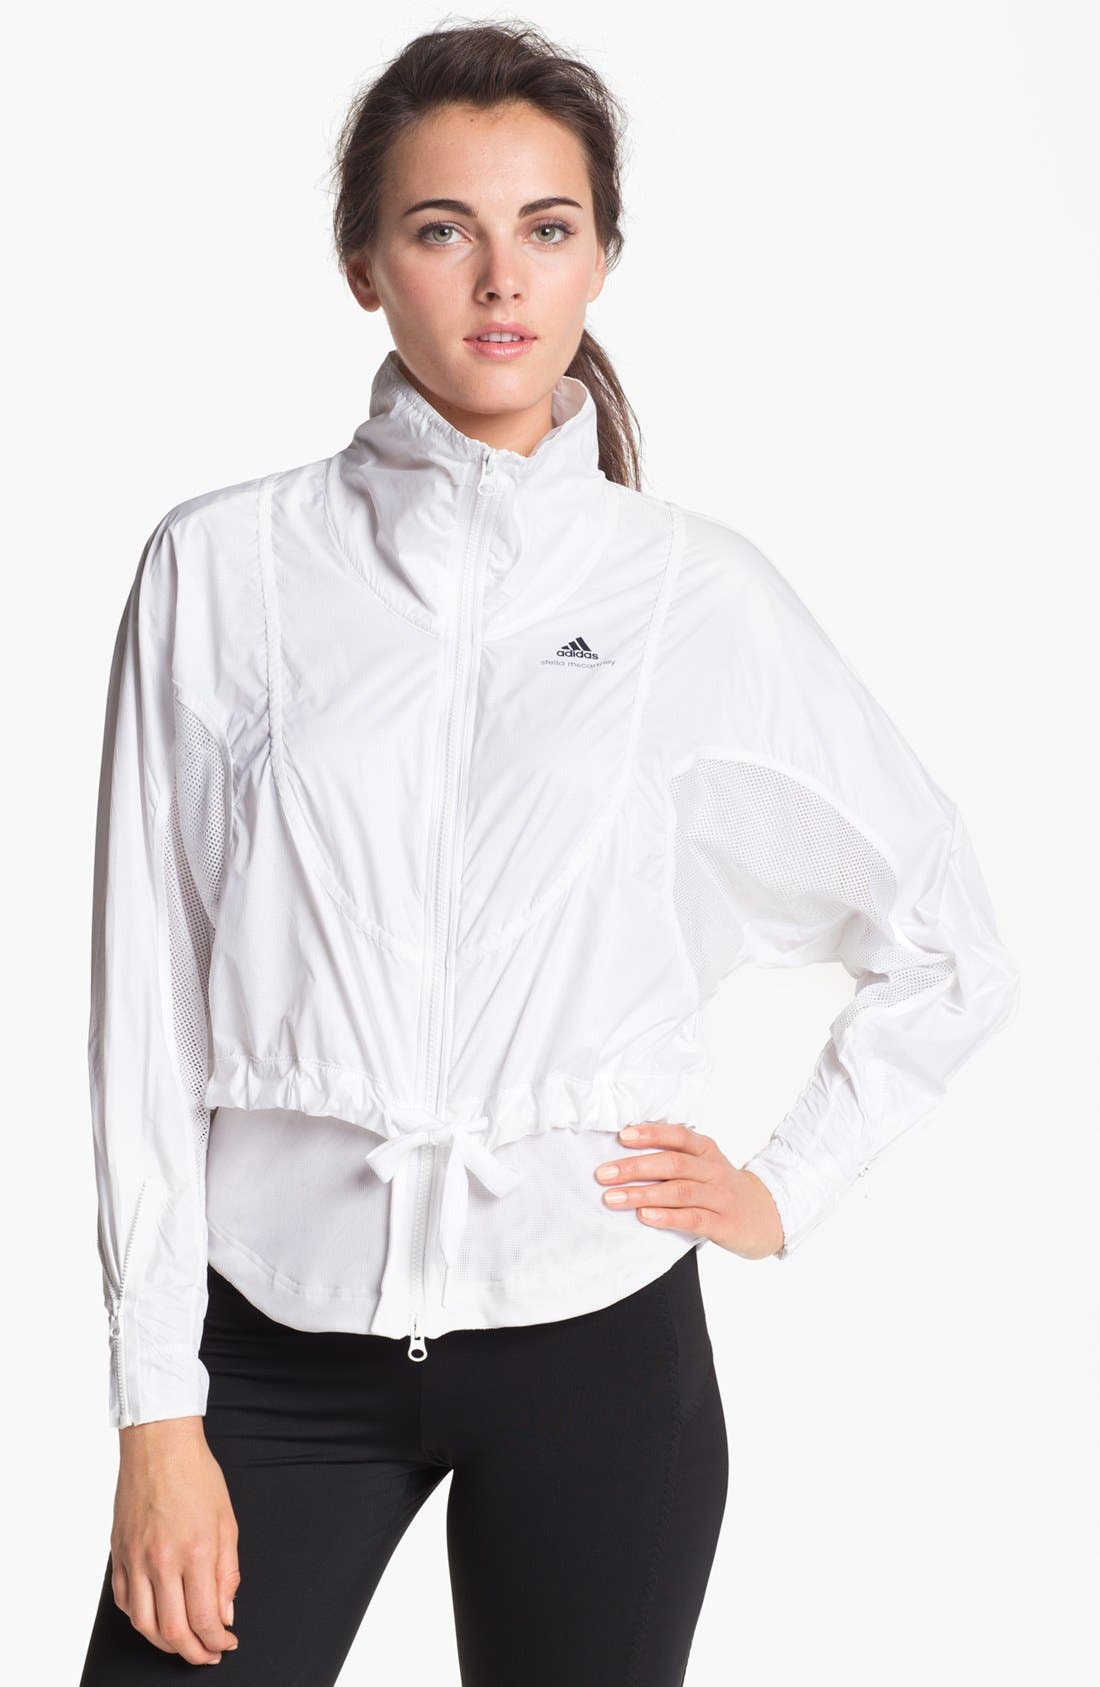 Alternate Image 1 Selected - adidas by Stella McCartney 'Barricade' Warm-Up Jacket